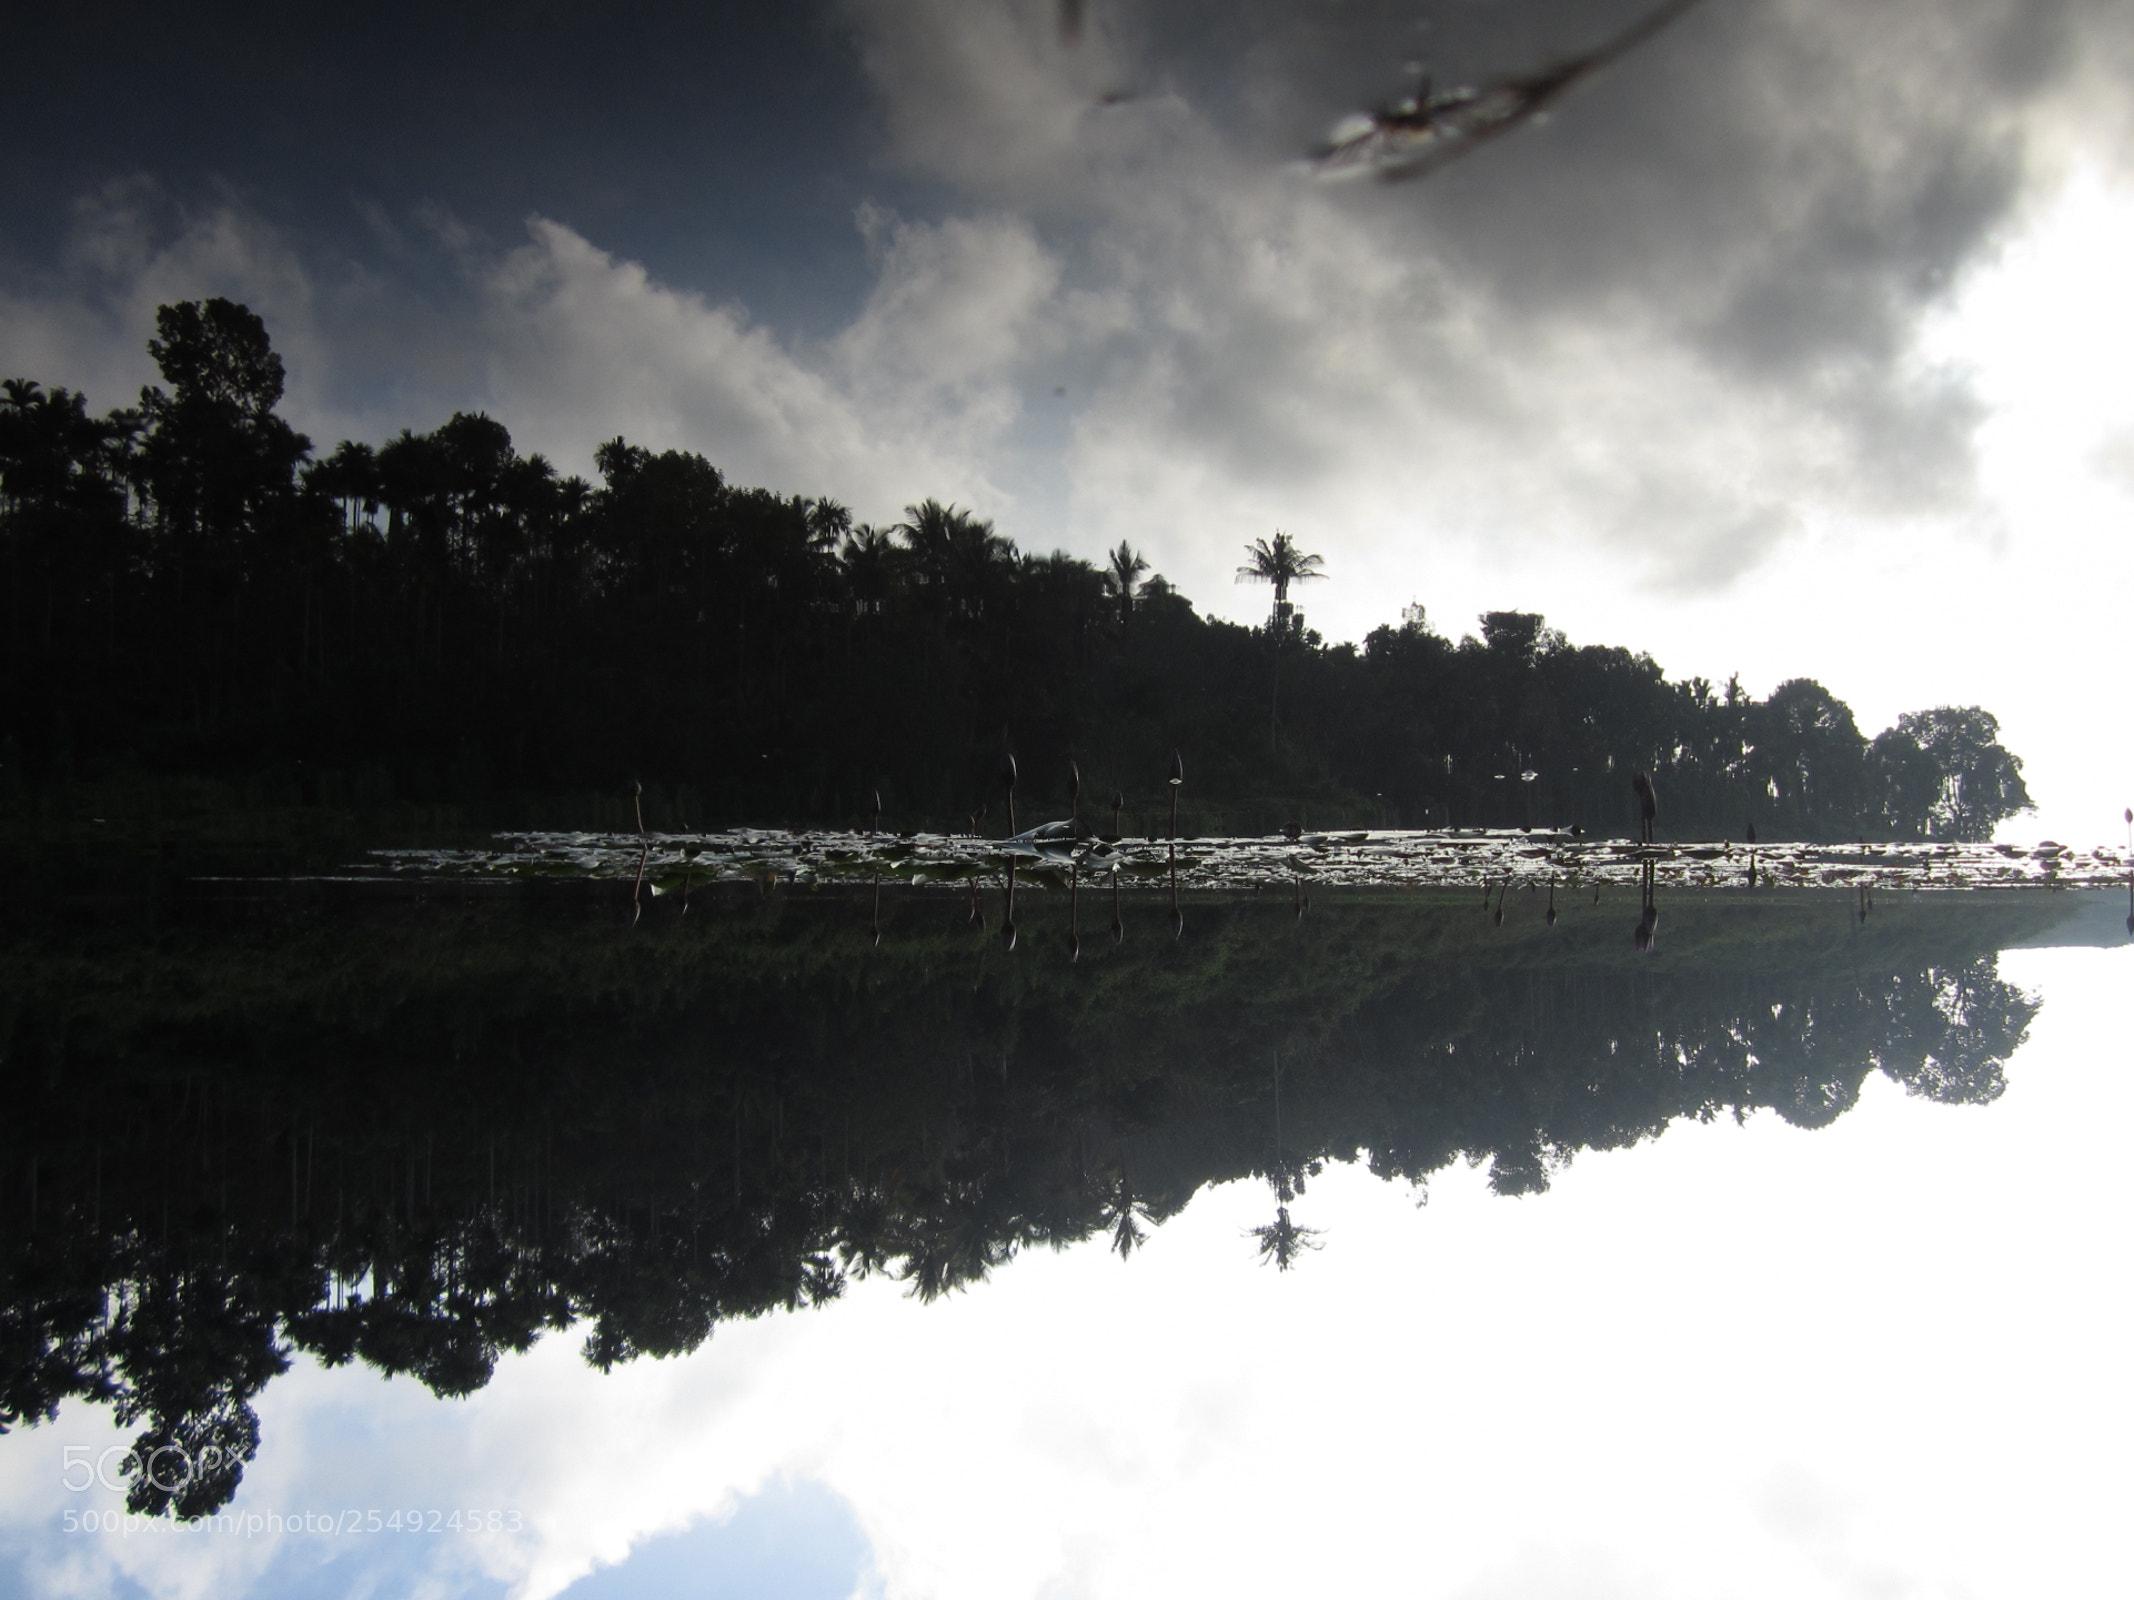 Reflection, Canon IXUS 115 HS